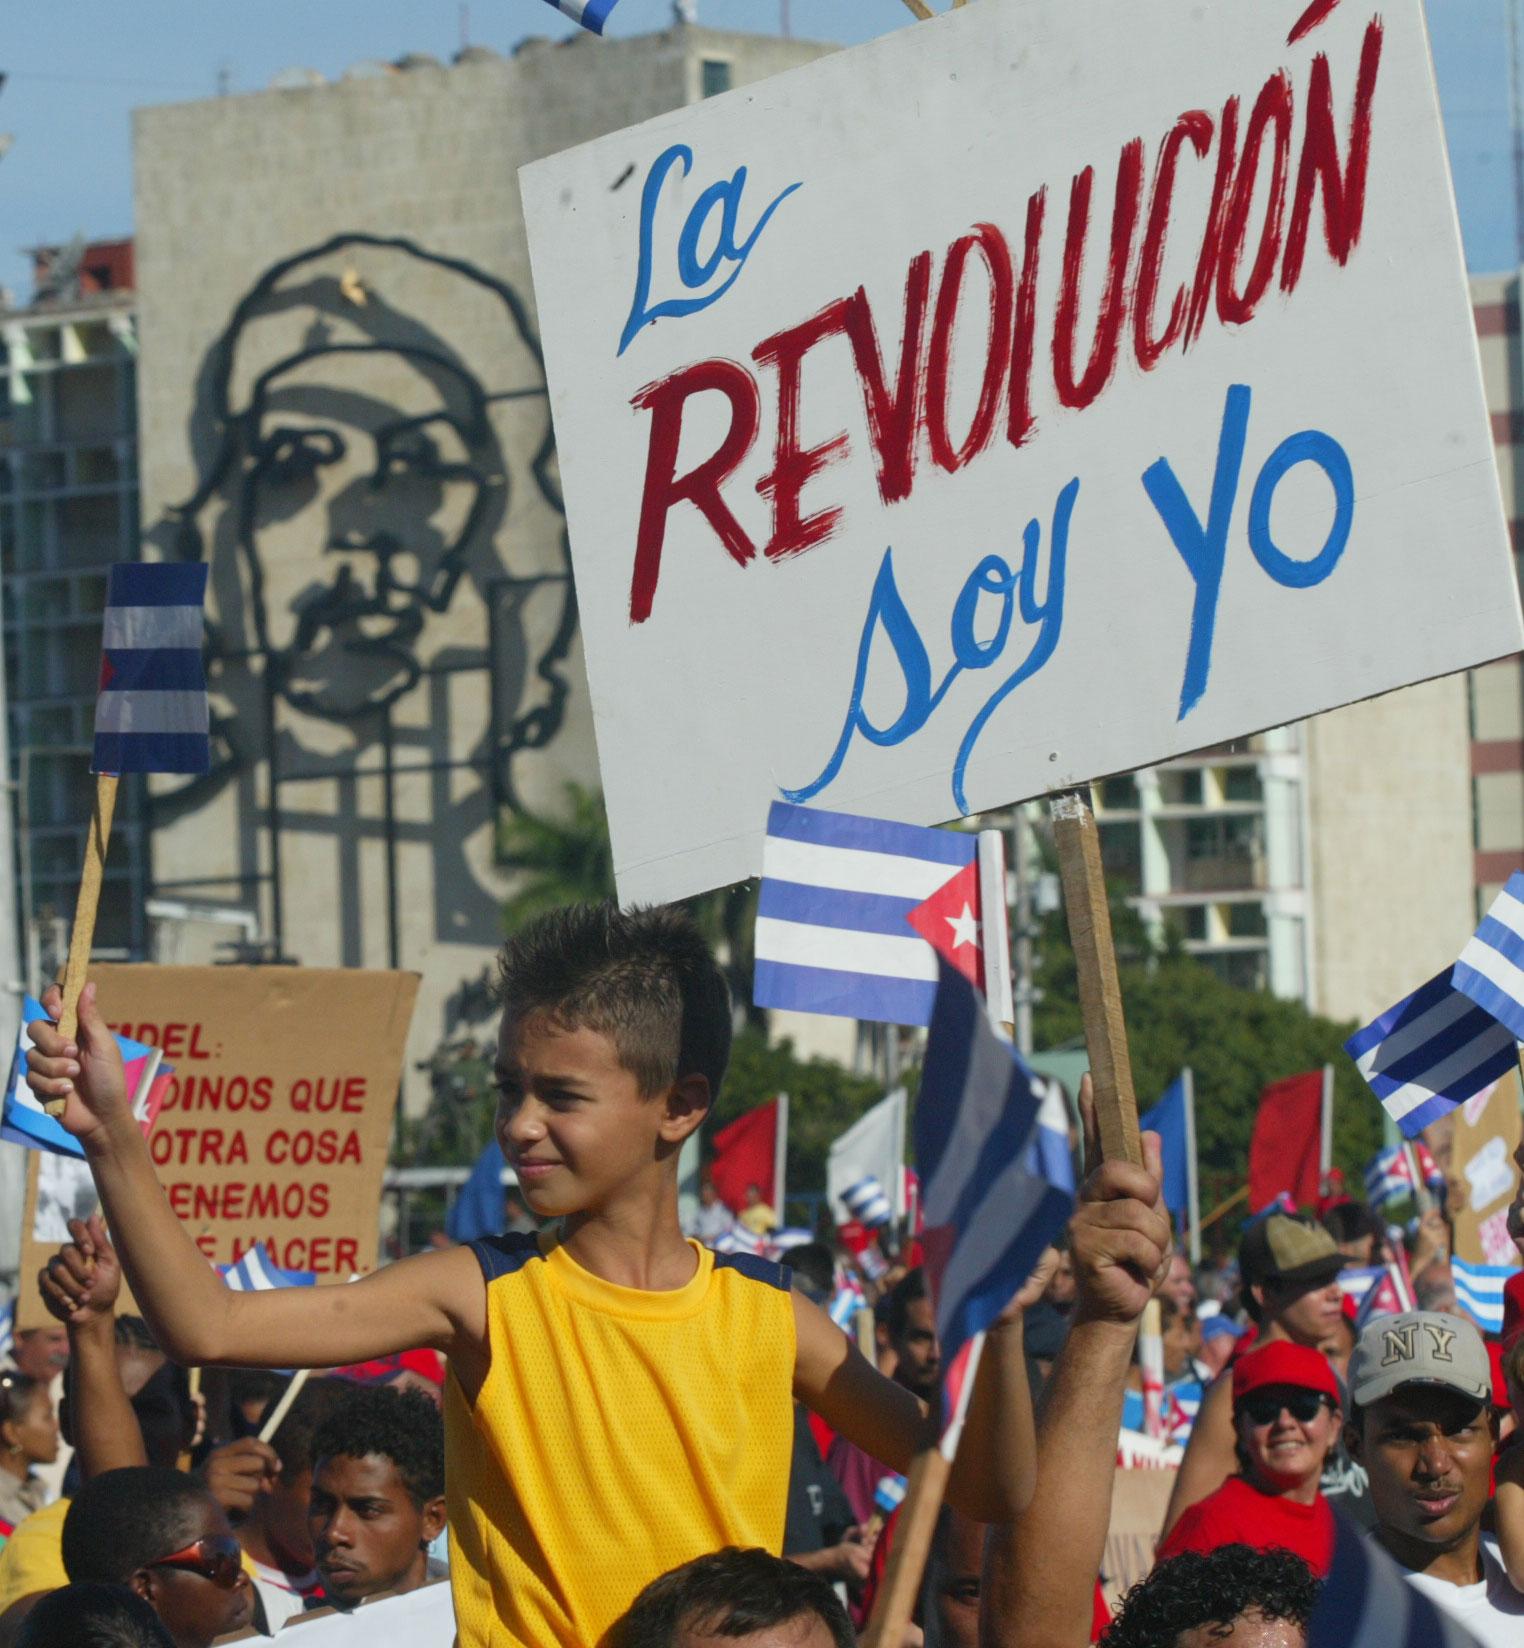 https://www.elcohetealaluna.com/wp-content/uploads/2021/07/Cuba-resiste.jpg